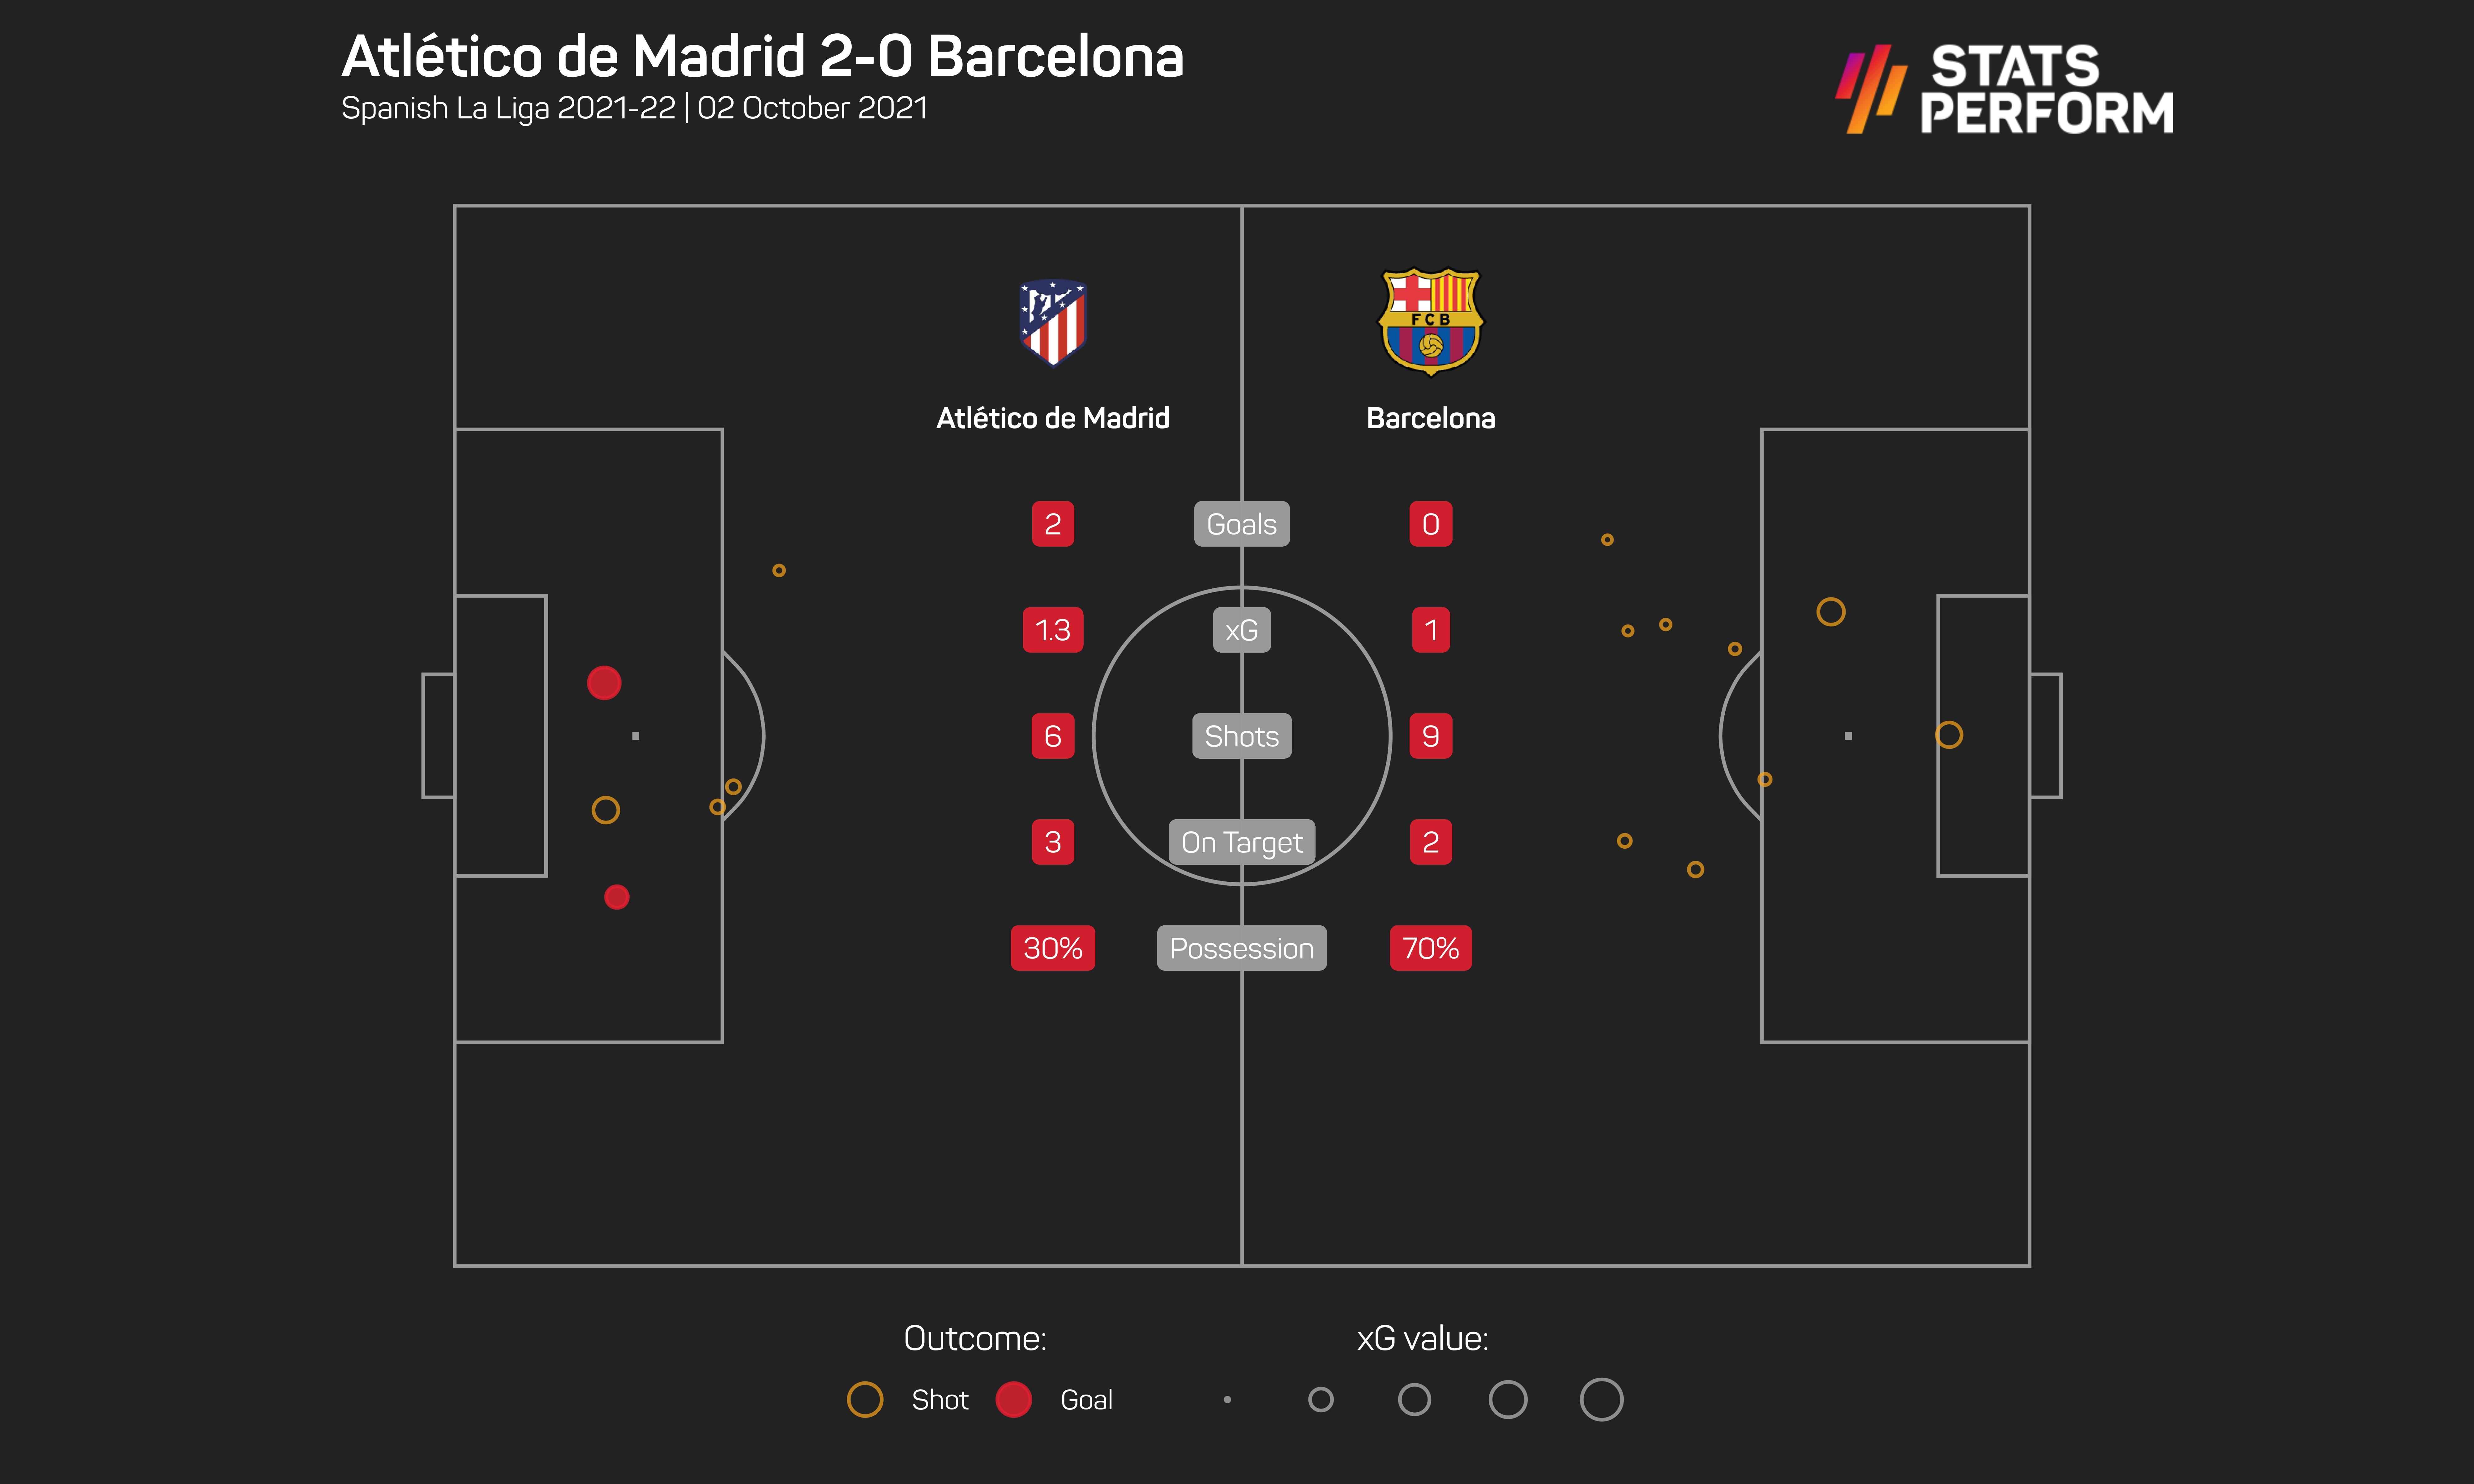 Atletico Madrid twice tore Barcelona apart